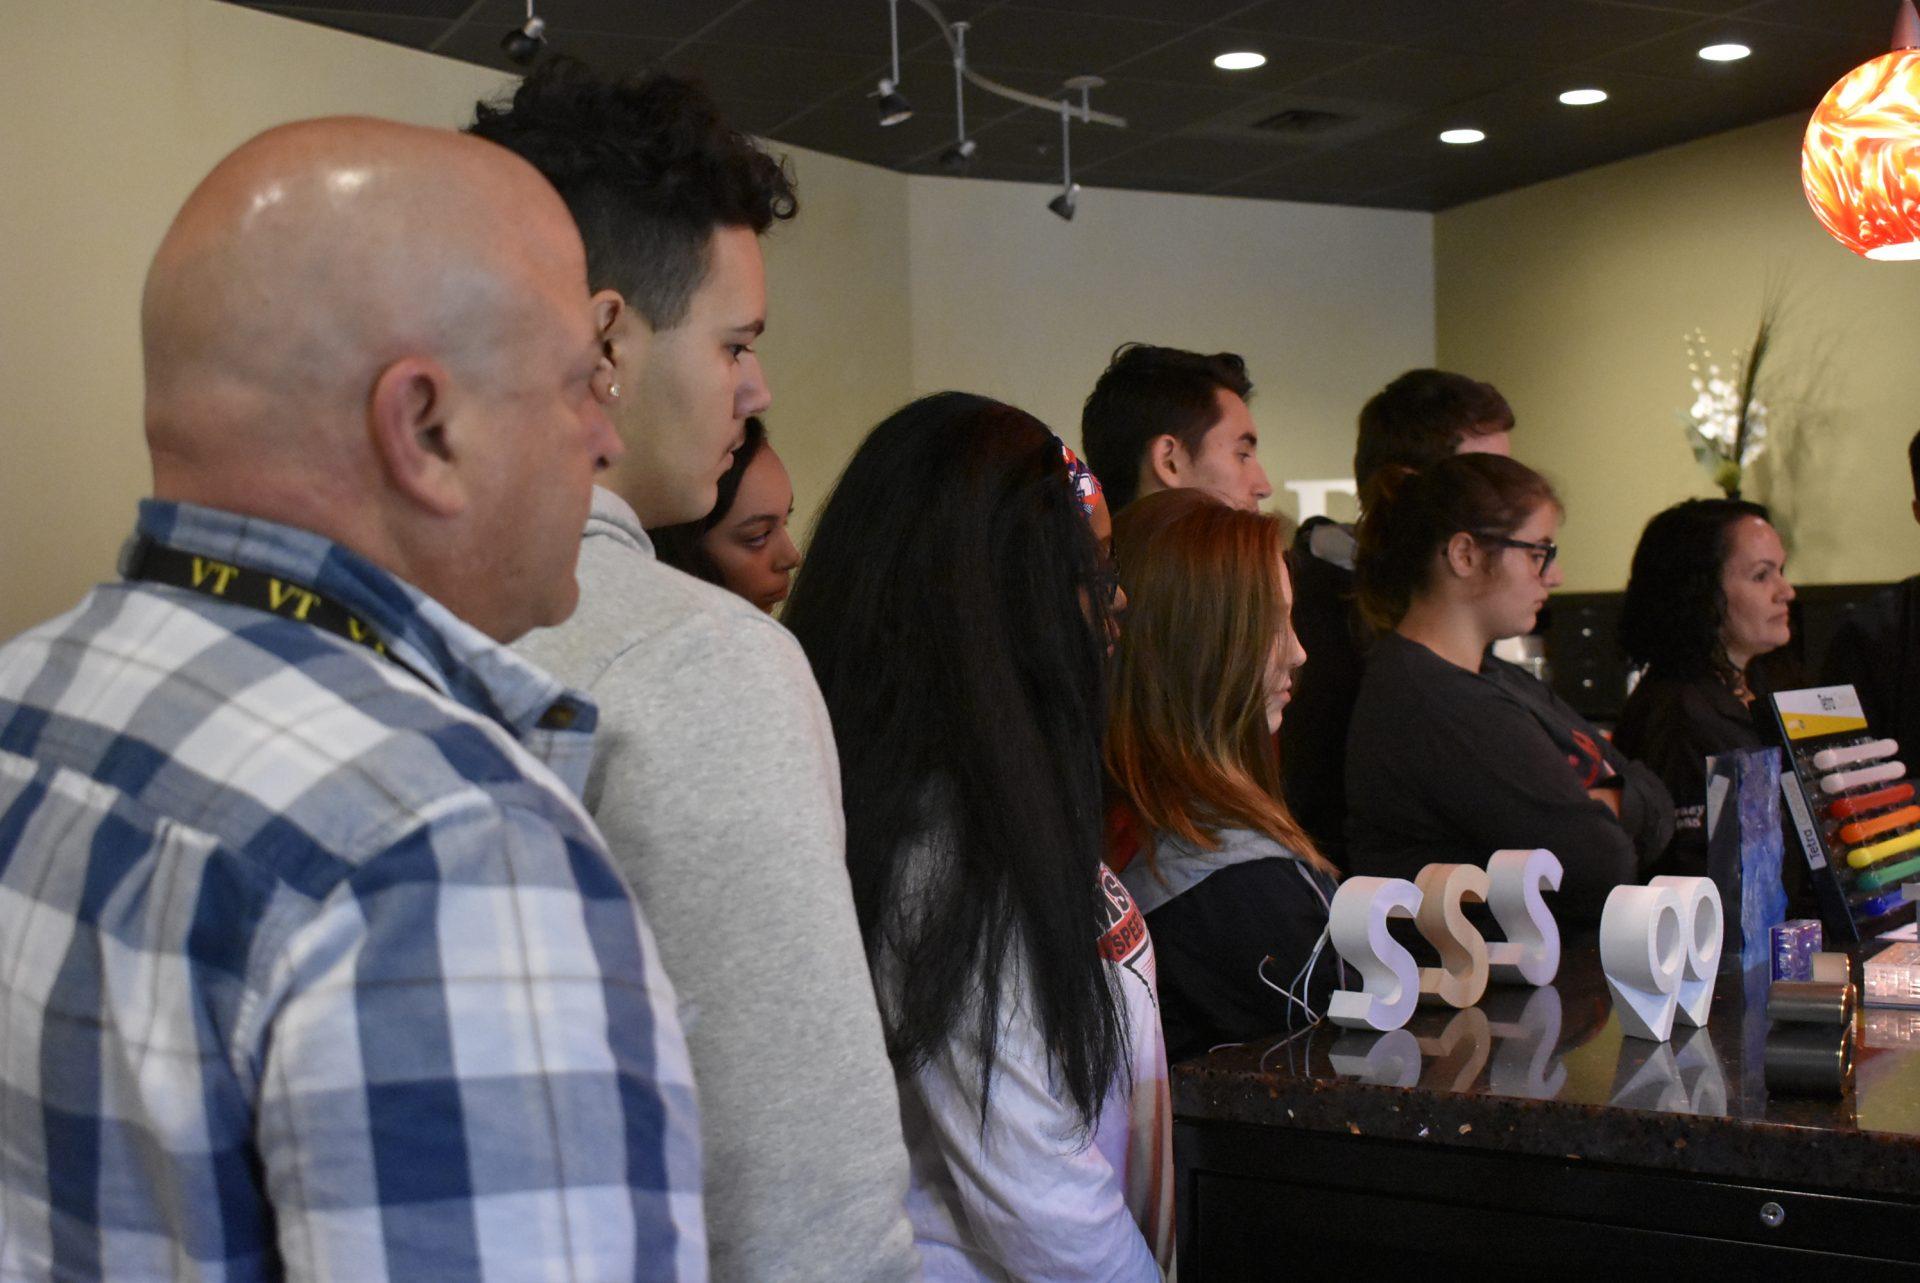 Architectural Design Students with Teacher Watching Presenter